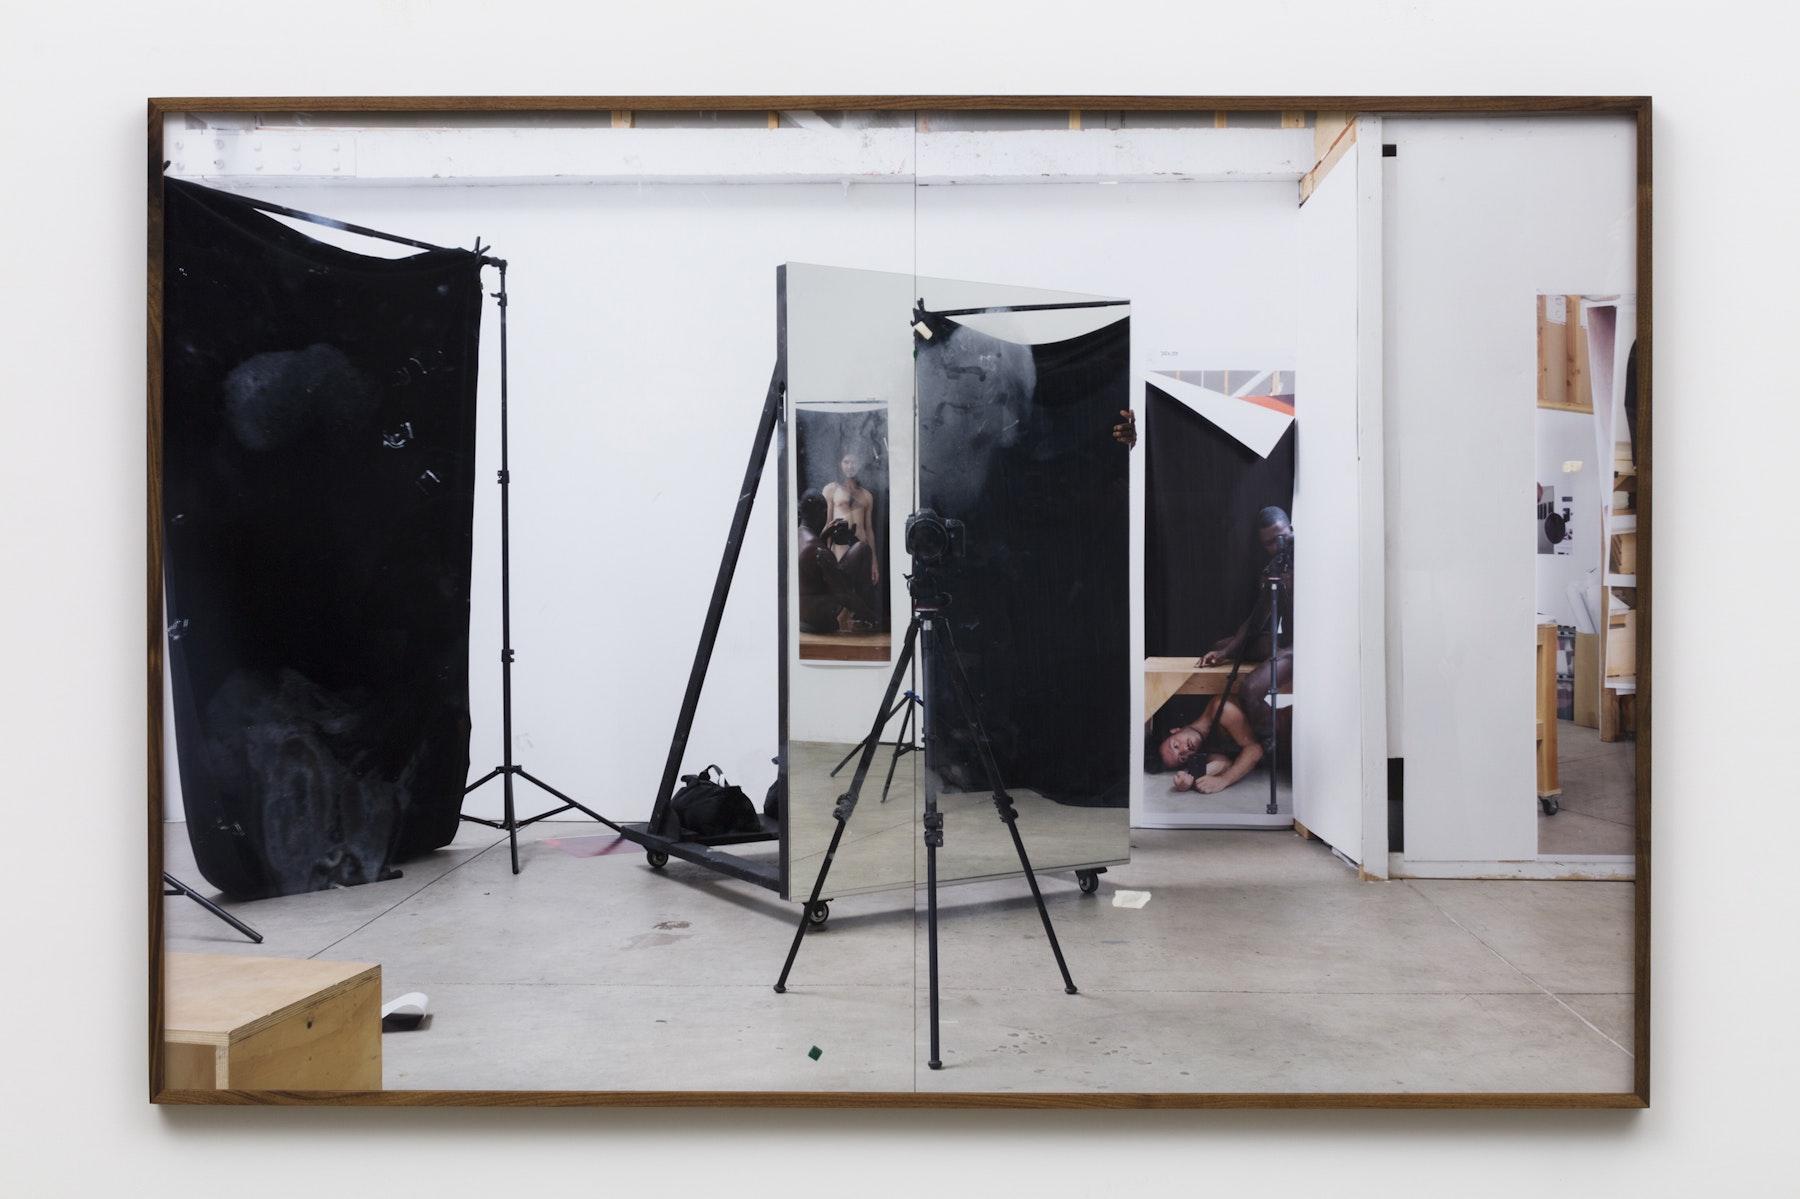 "Paul Mpagi Sepuya ""Studio (0X5A5038),"" 2020 Archival pigment print 50 x 75"" [HxW] (127 x 190.5 cm) Edition of 5, 2 AP Inventory #SEP664 Courtesy of the artist and Vielmetter Los Angeles Photo credit: Jeff McLane"